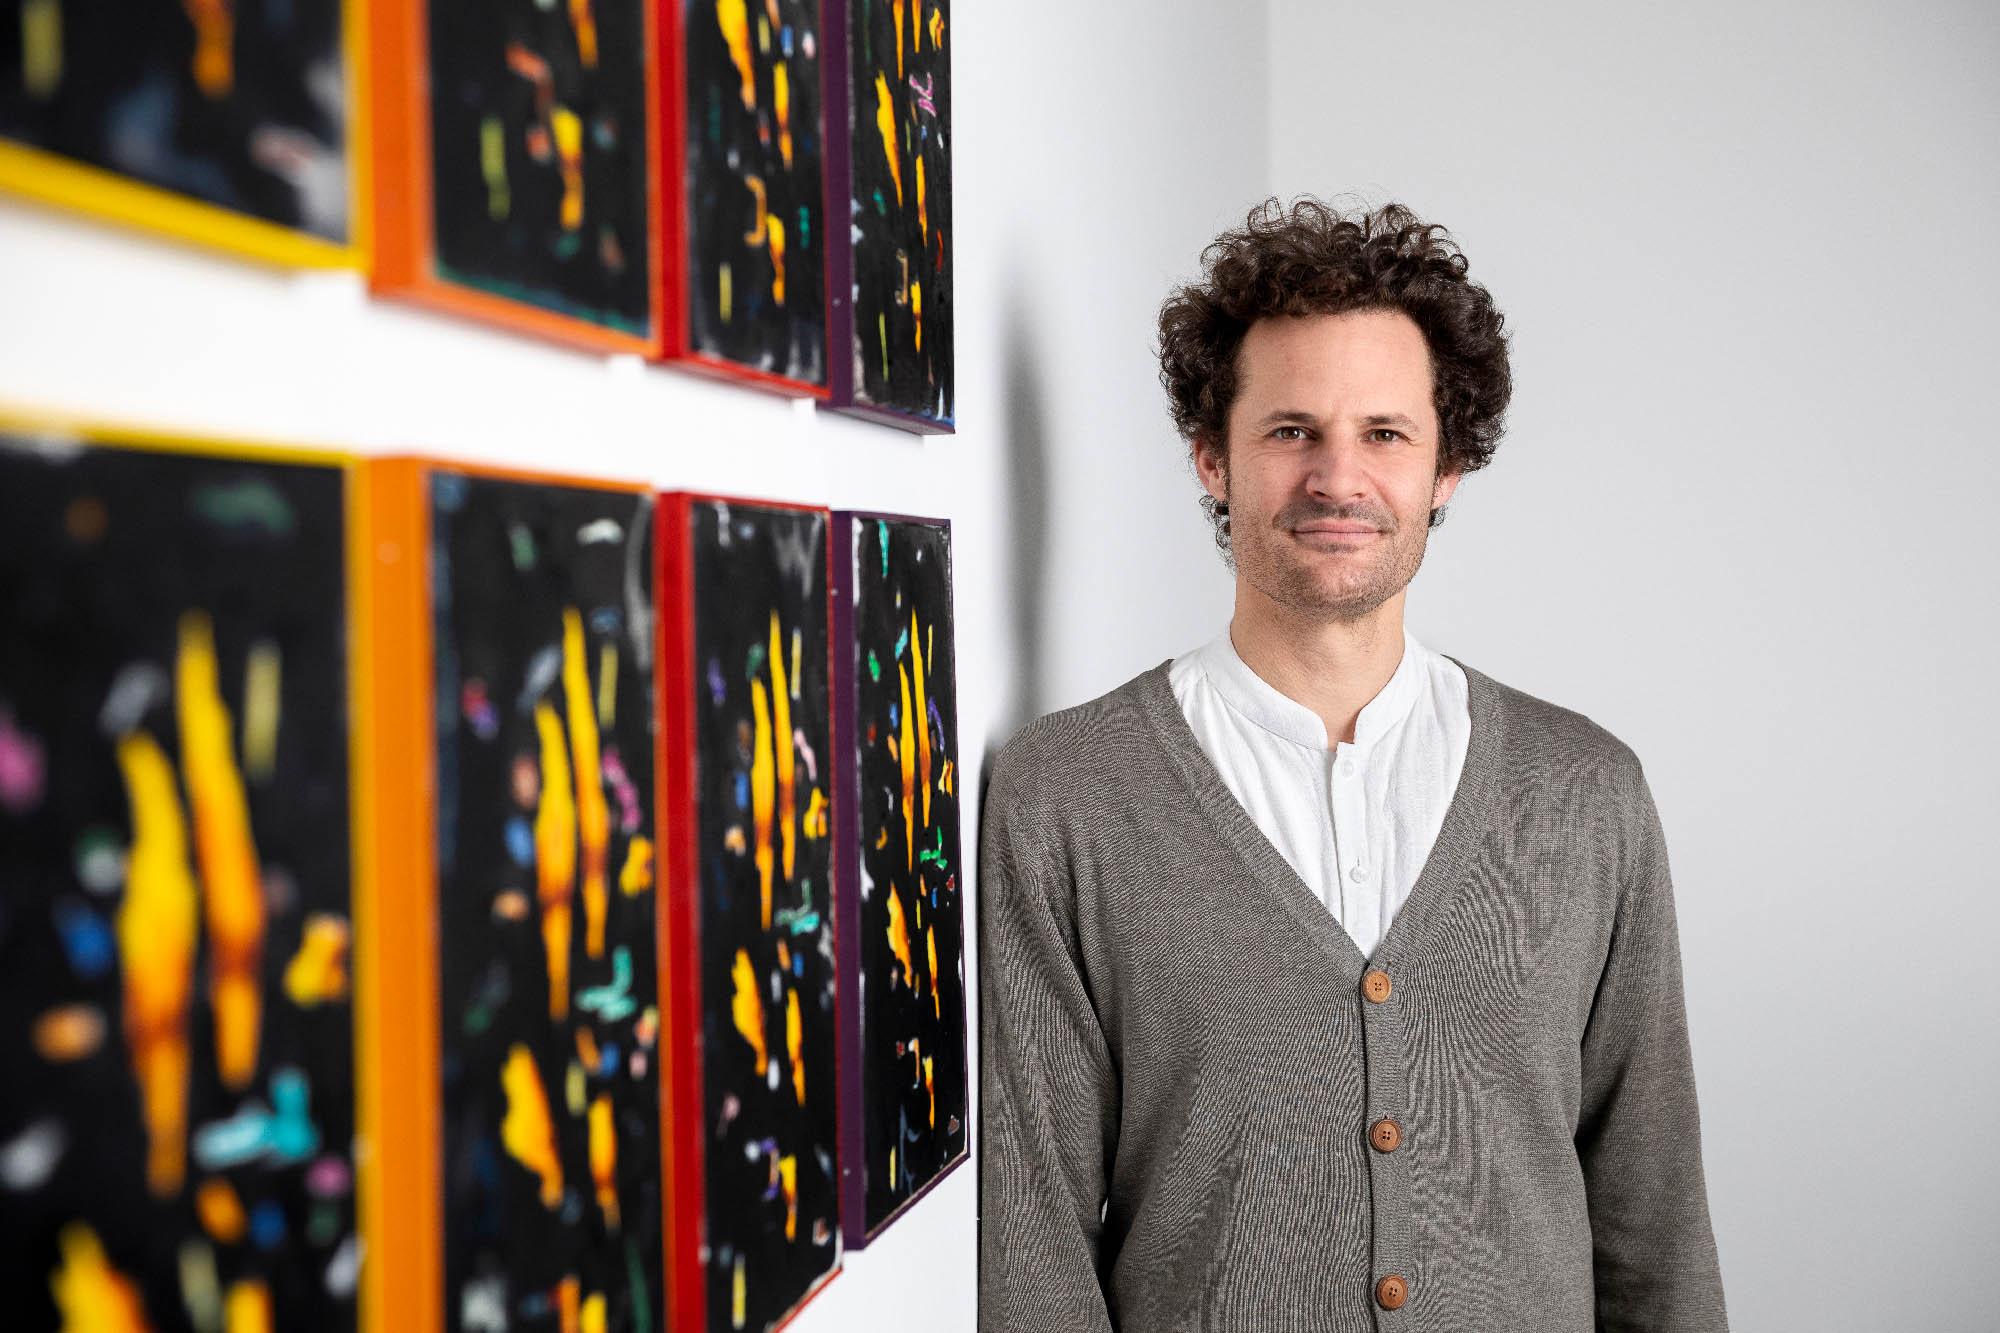 philip mentzingen, paintings, munchies art club, homer, simpsons